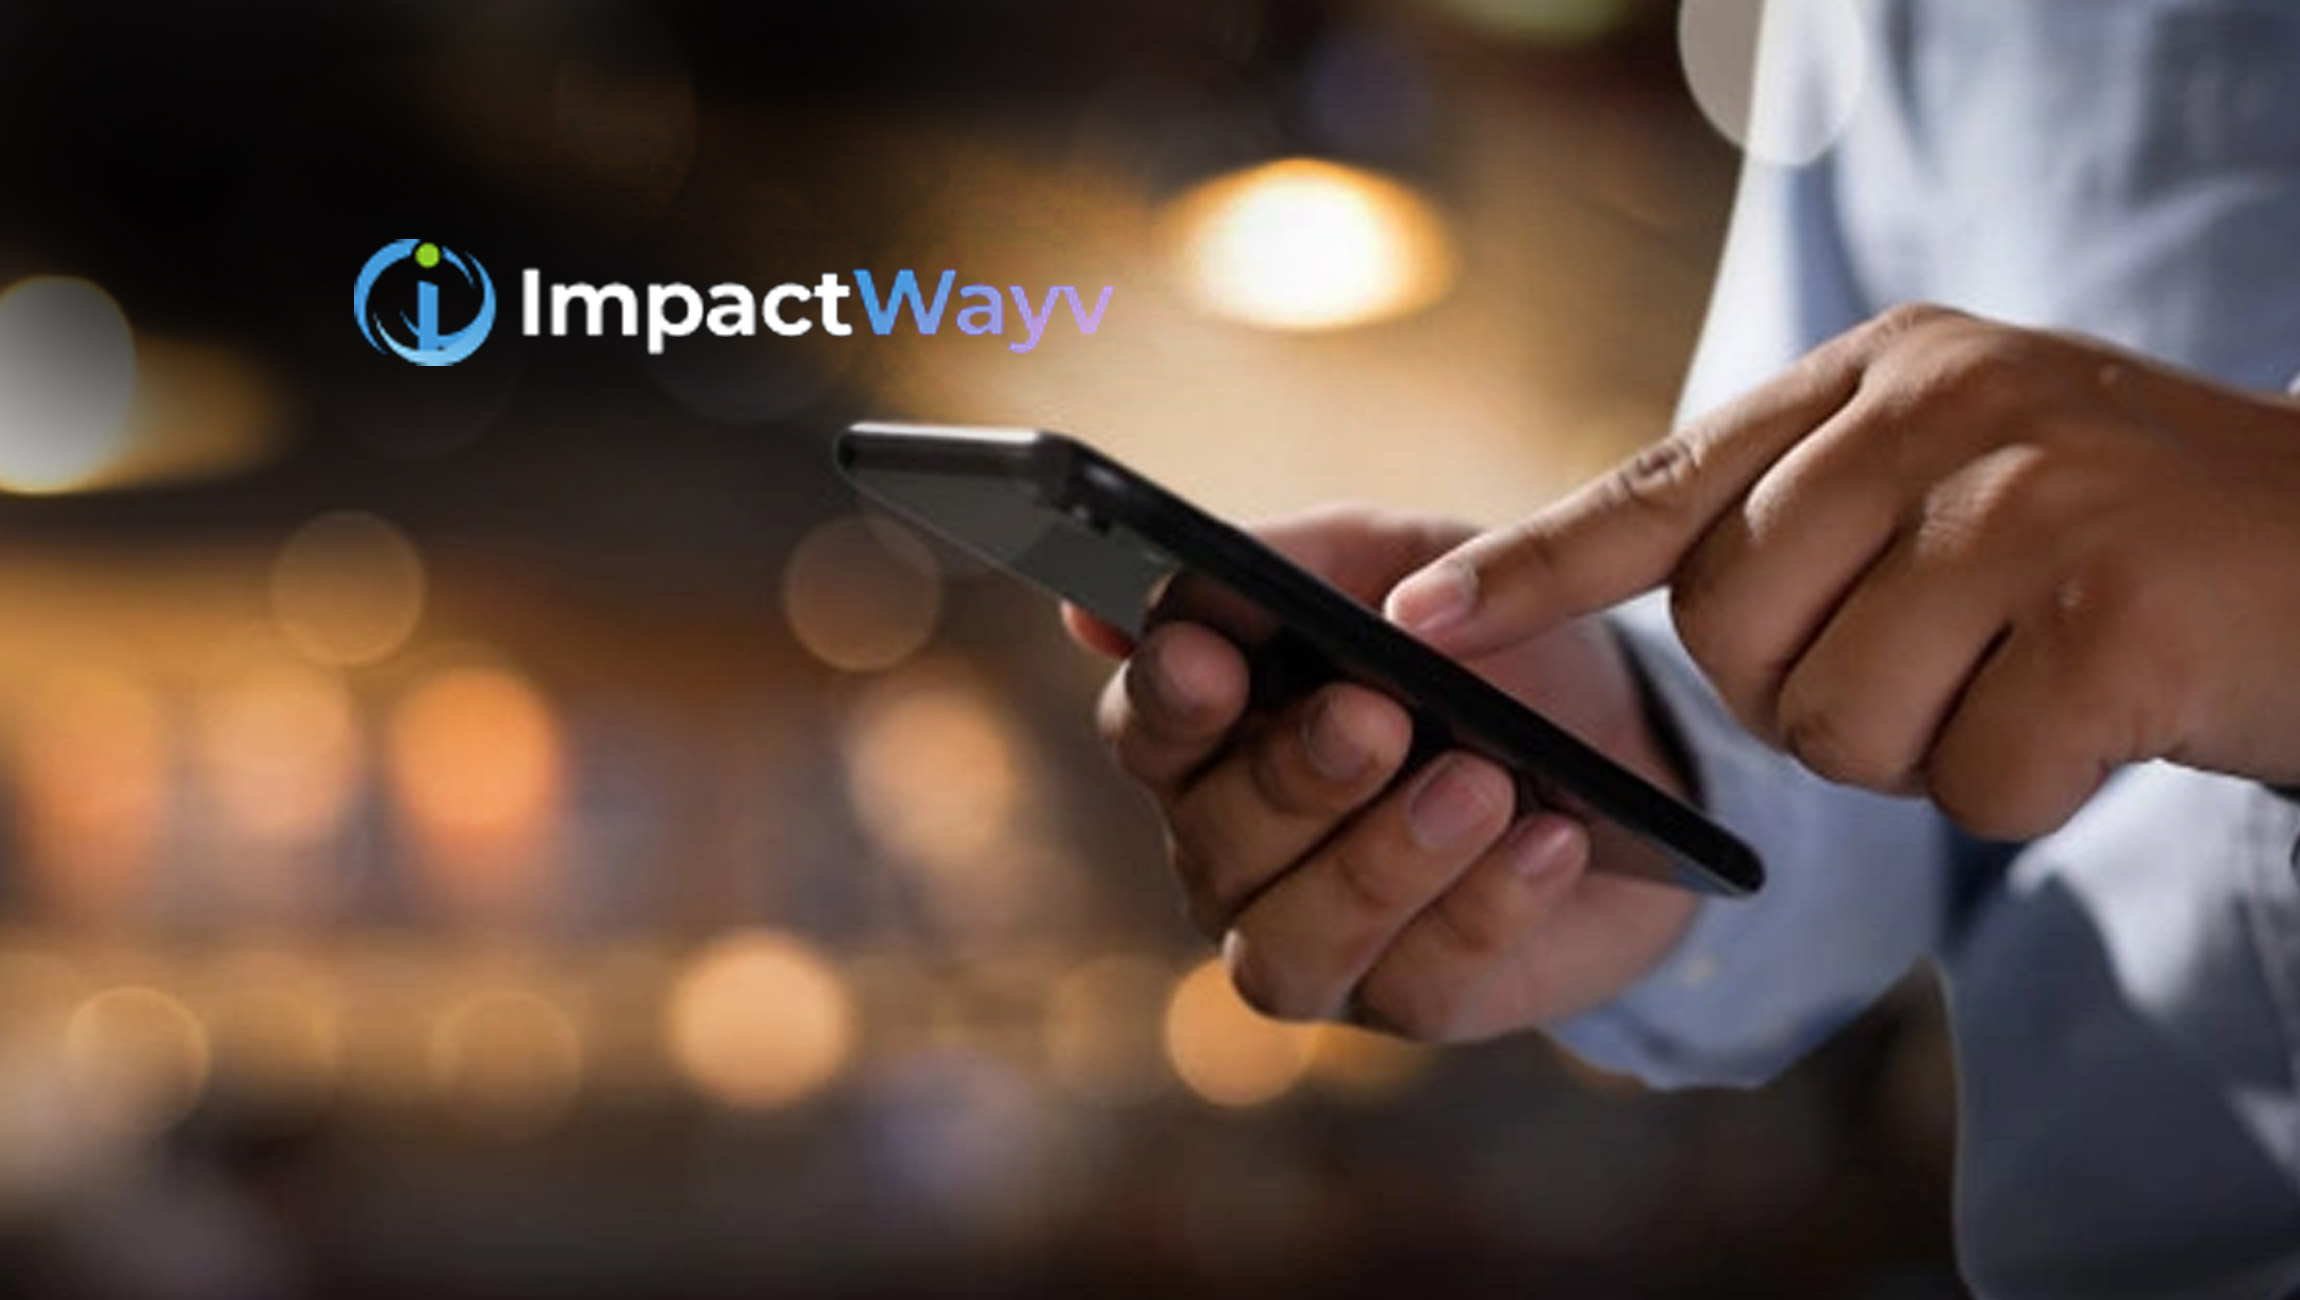 ImpactWayv™ Launches Social Media Platform Focused On Social Good